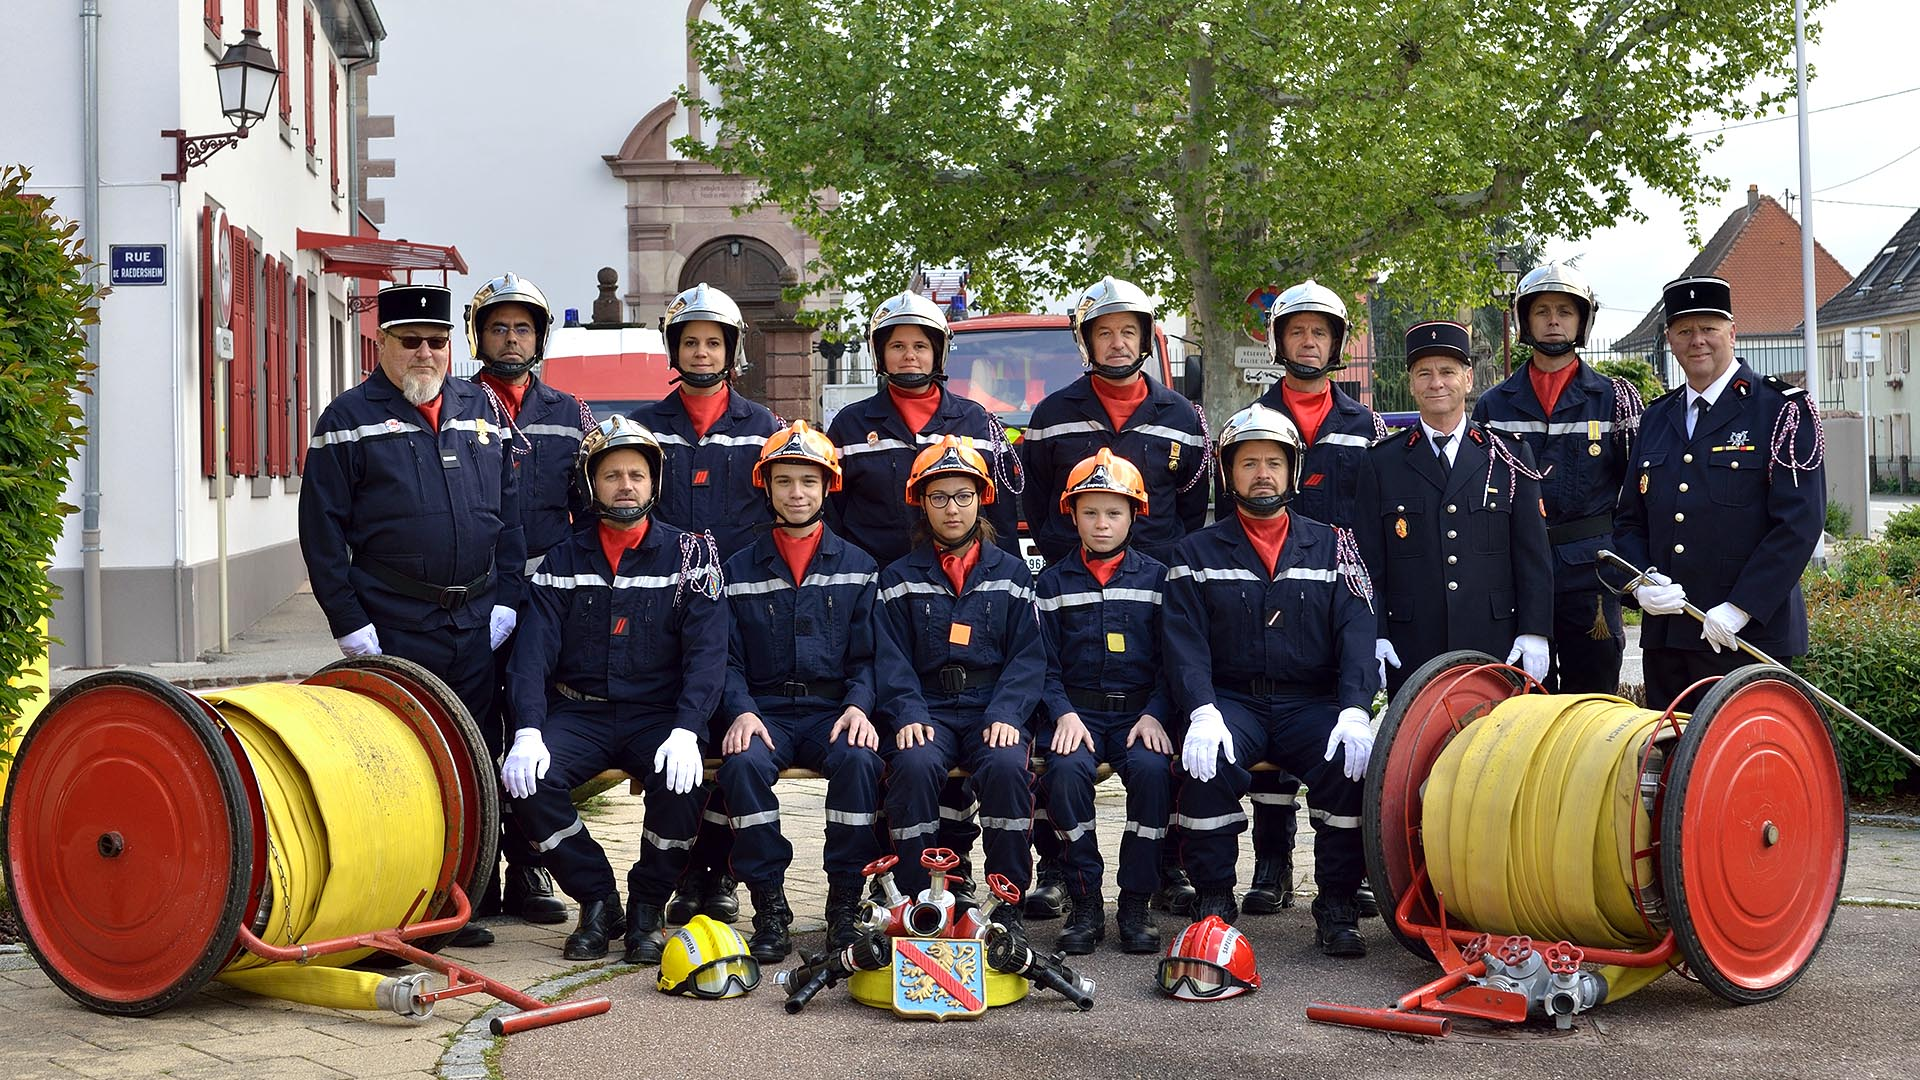 Les pompiers de Feldkirch